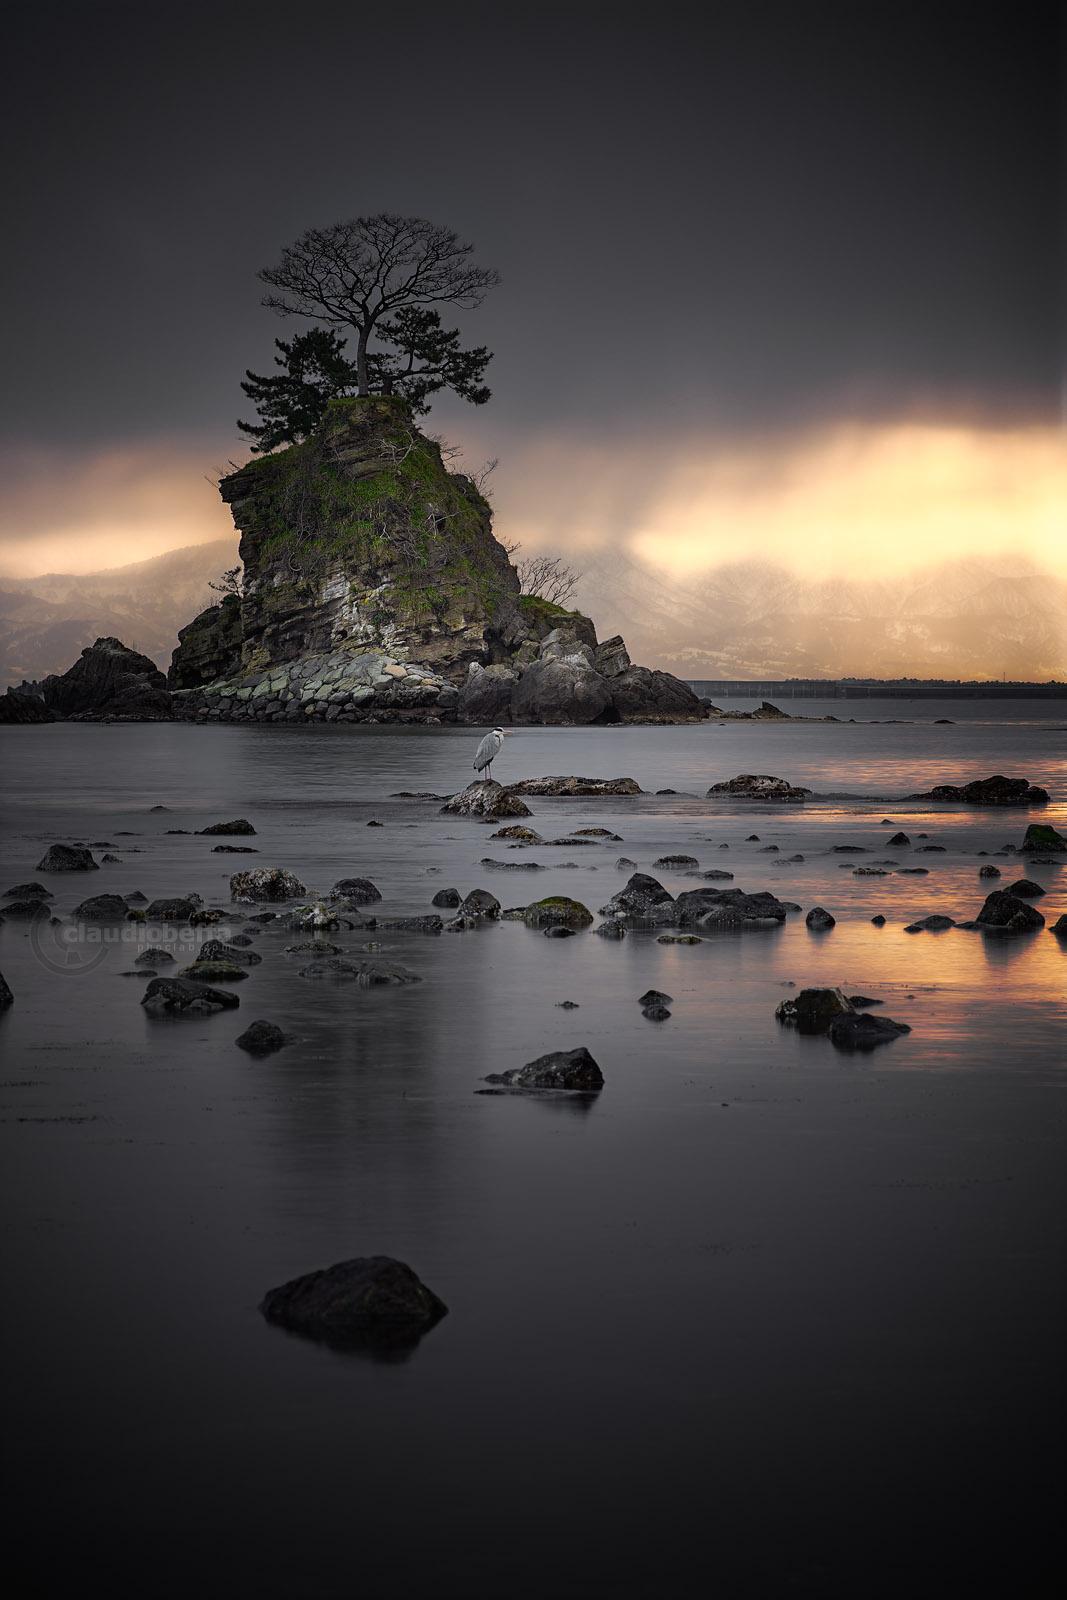 Sunrise, Sea, Amaharashi, Island, Tree, Heron, Gold, Mountains, Toyama, Japan, HDR, Pentax